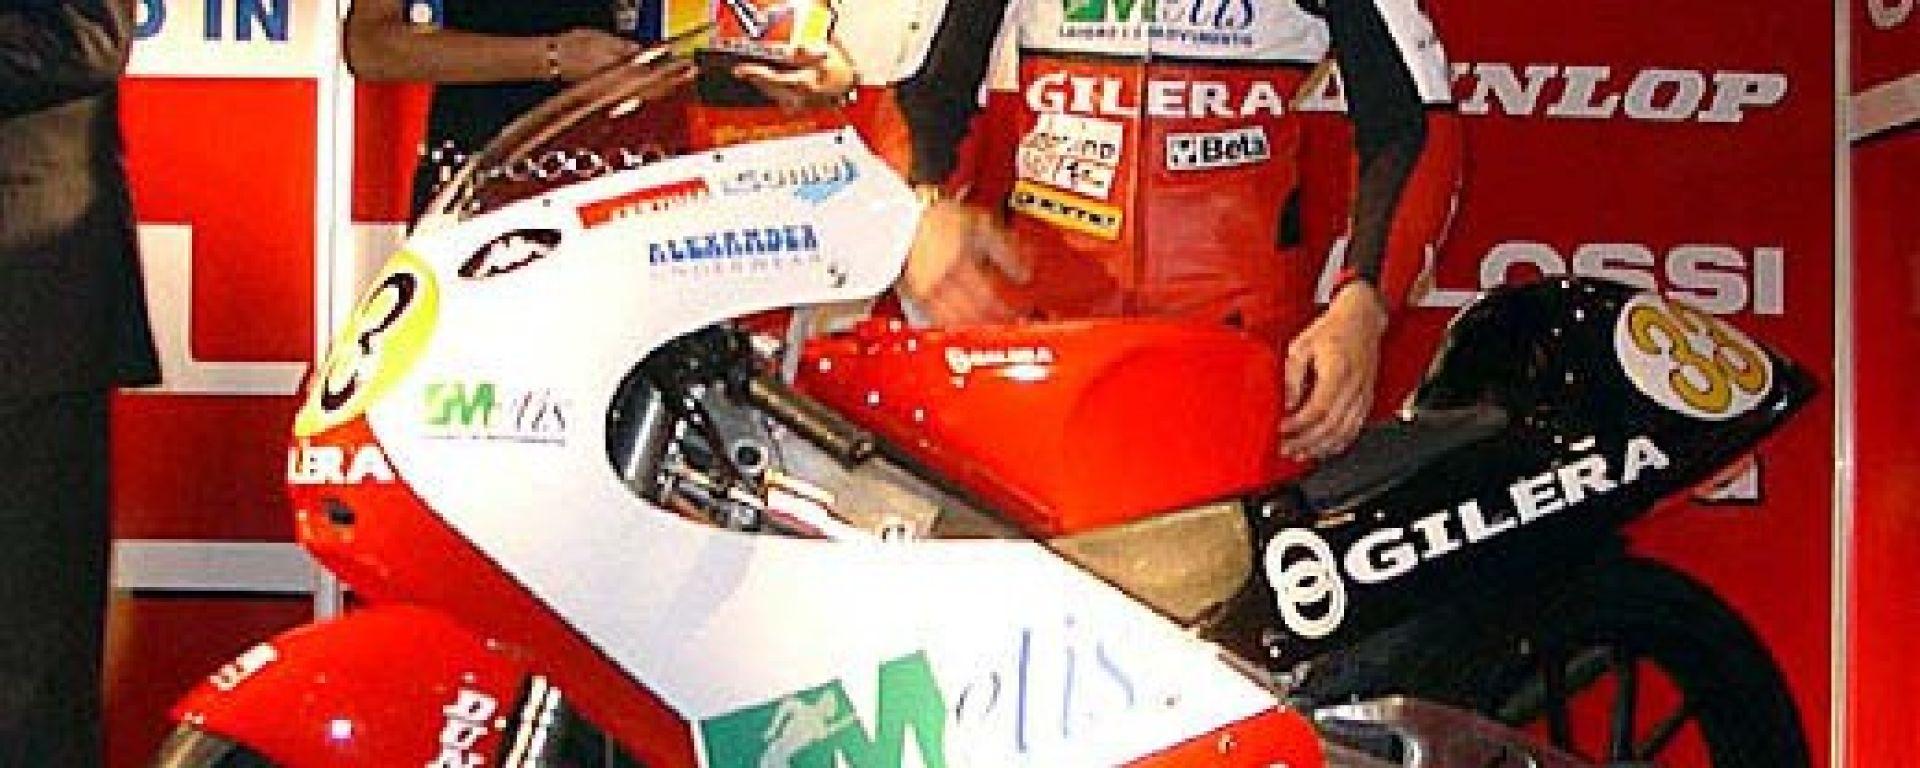 Gilera: debutta la 125 GP